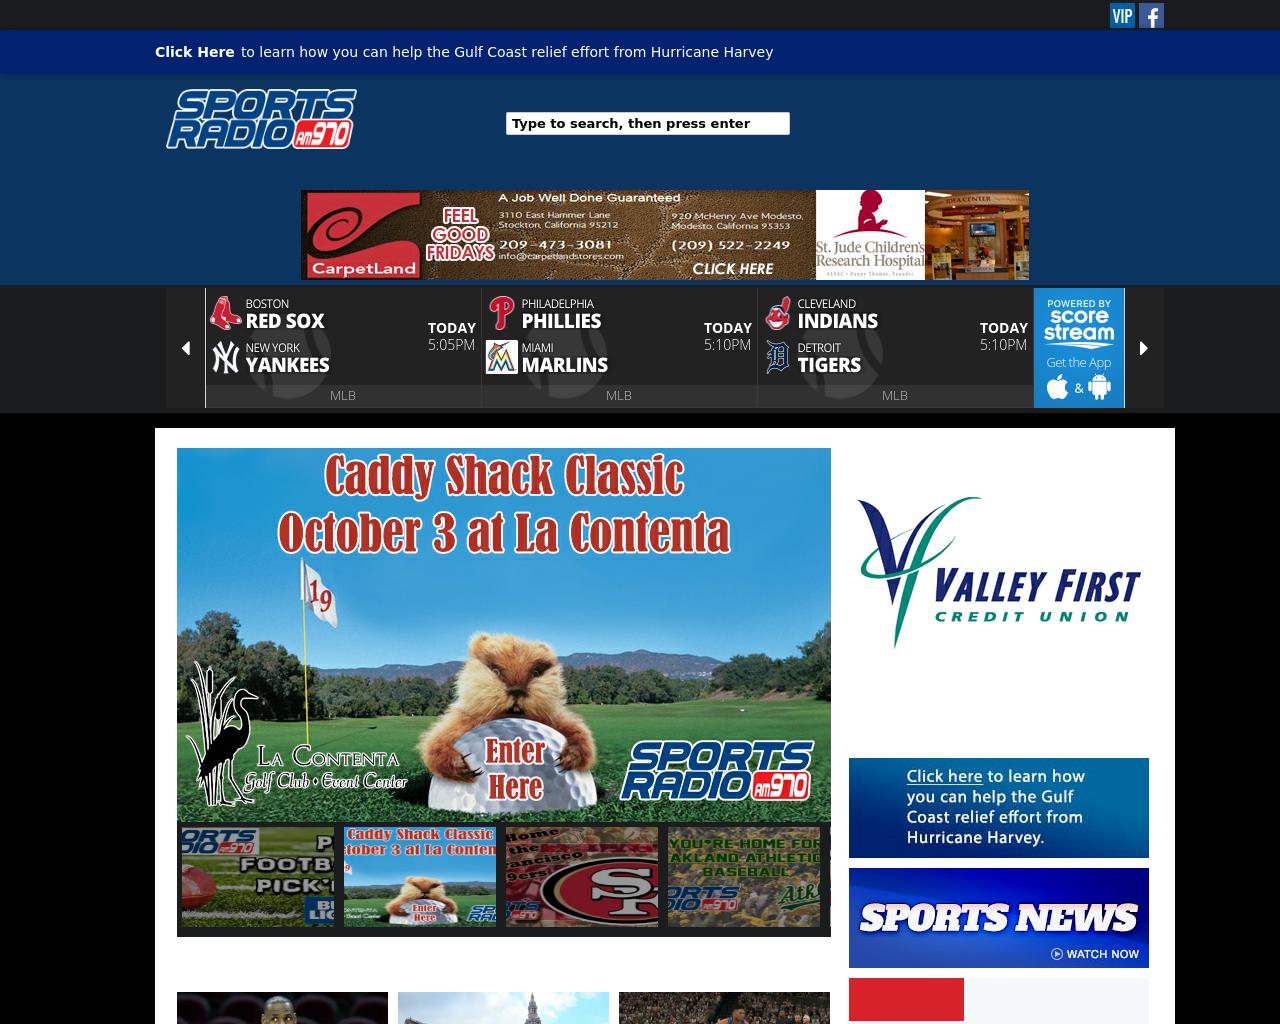 Sports-Radio-970-Advertising-Reviews-Pricing